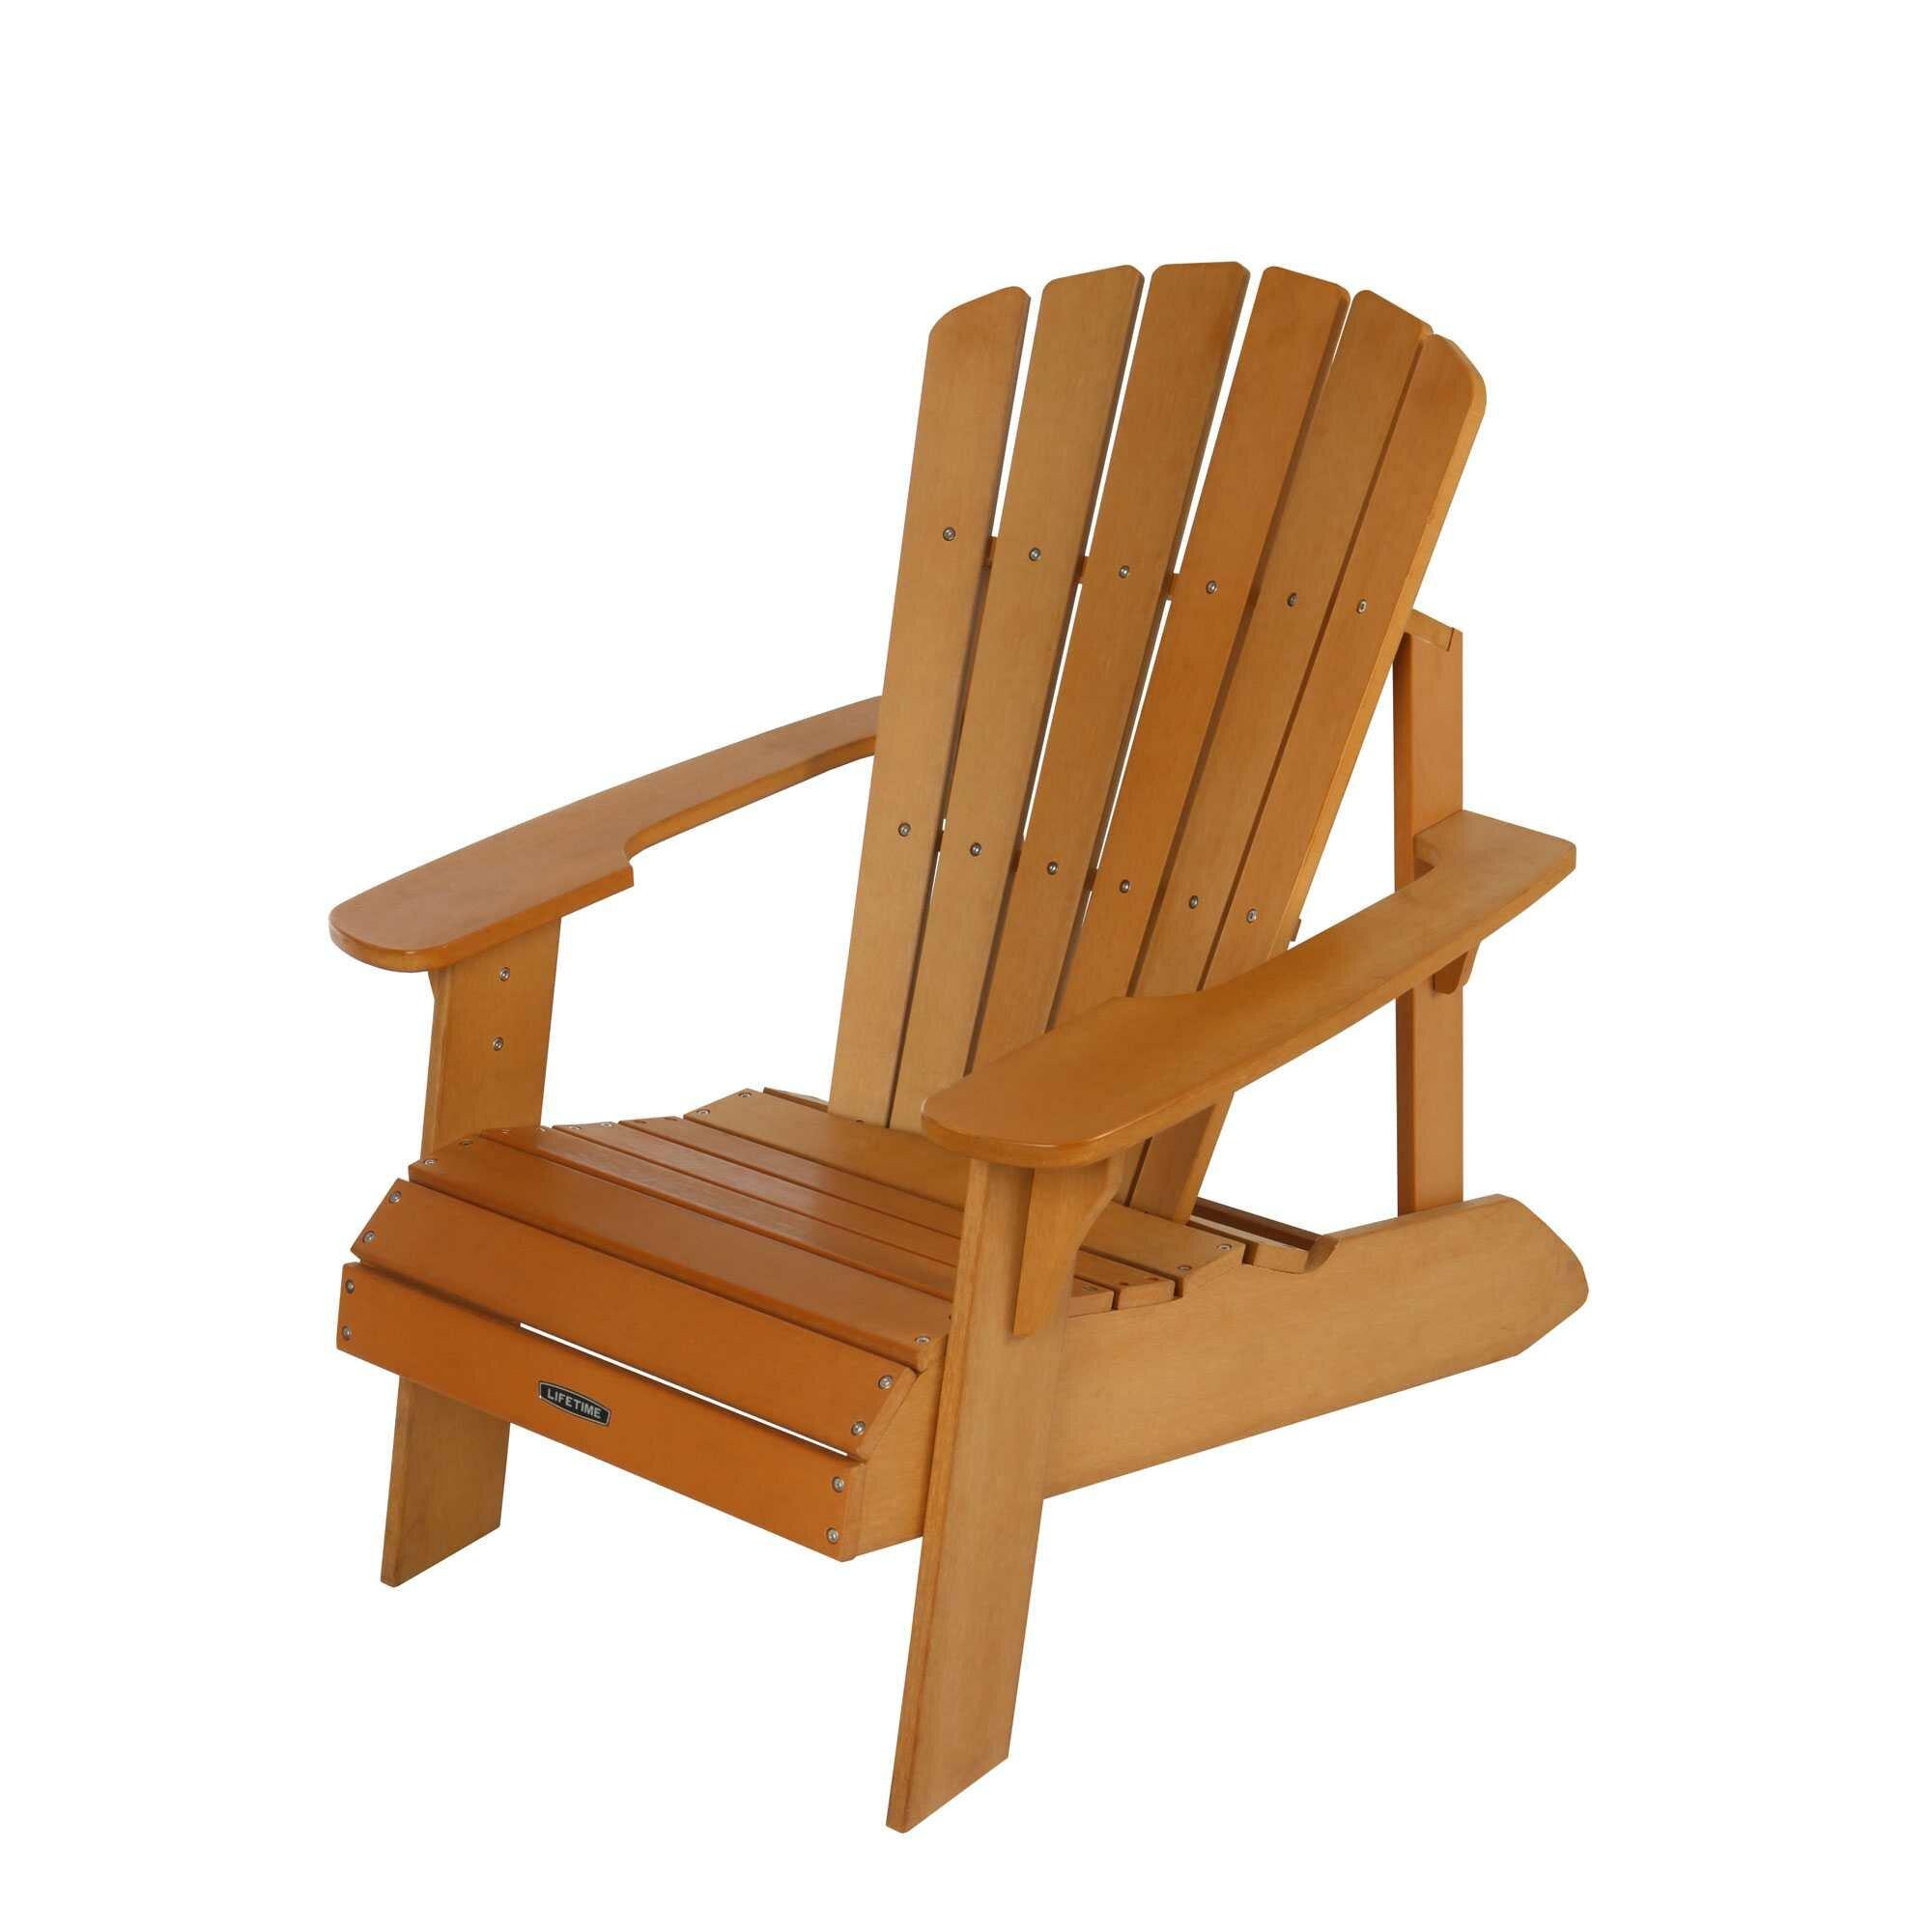 Genial Lifetime Plastic Adirondack Chair U0026 Reviews | Wayfair